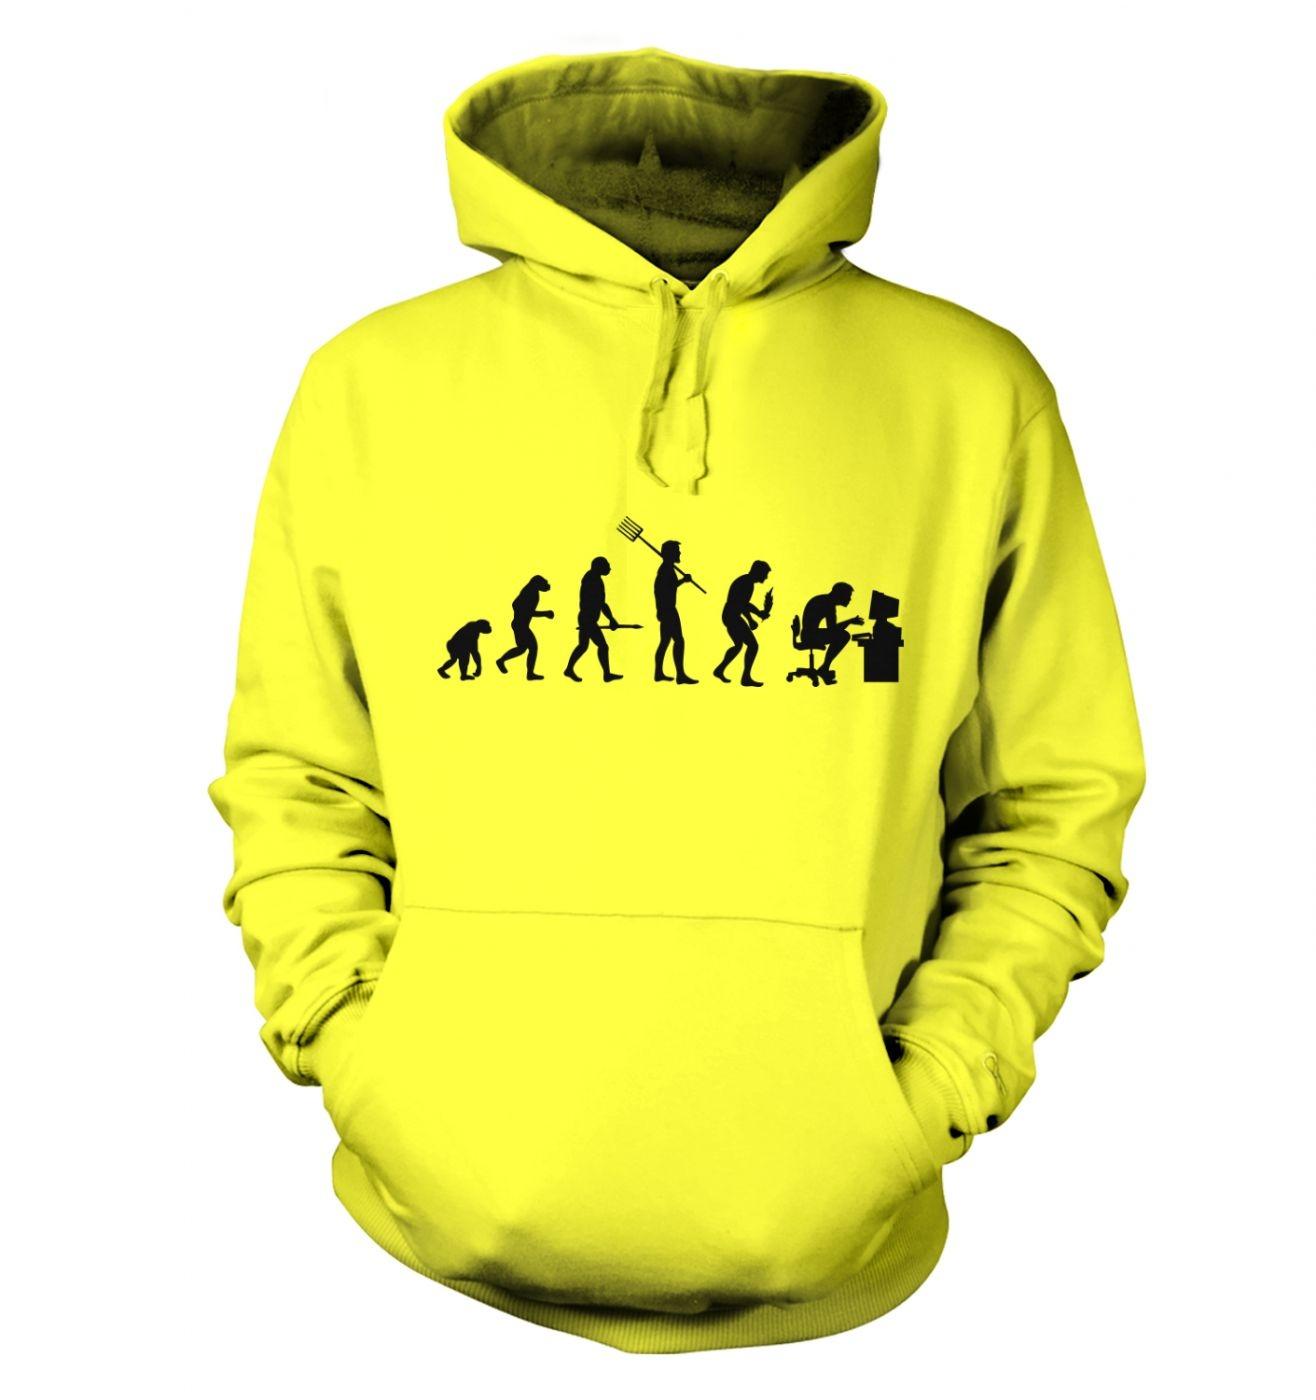 Evolution of the geeky man hoodie